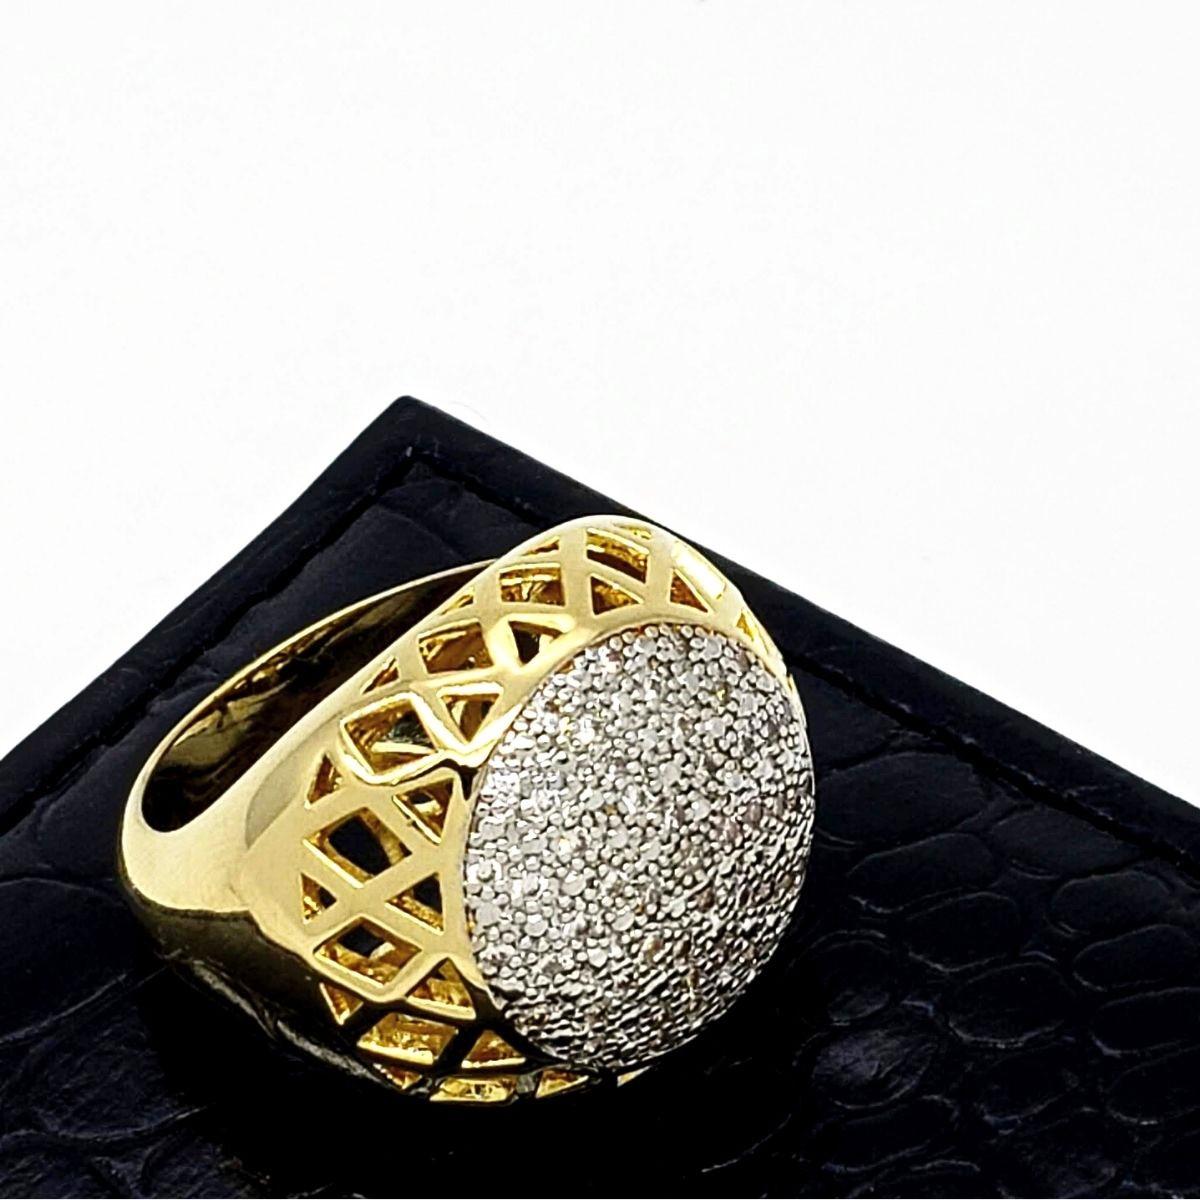 Anel Cravejado De Zirconias Banho De Ouro 18k 2526